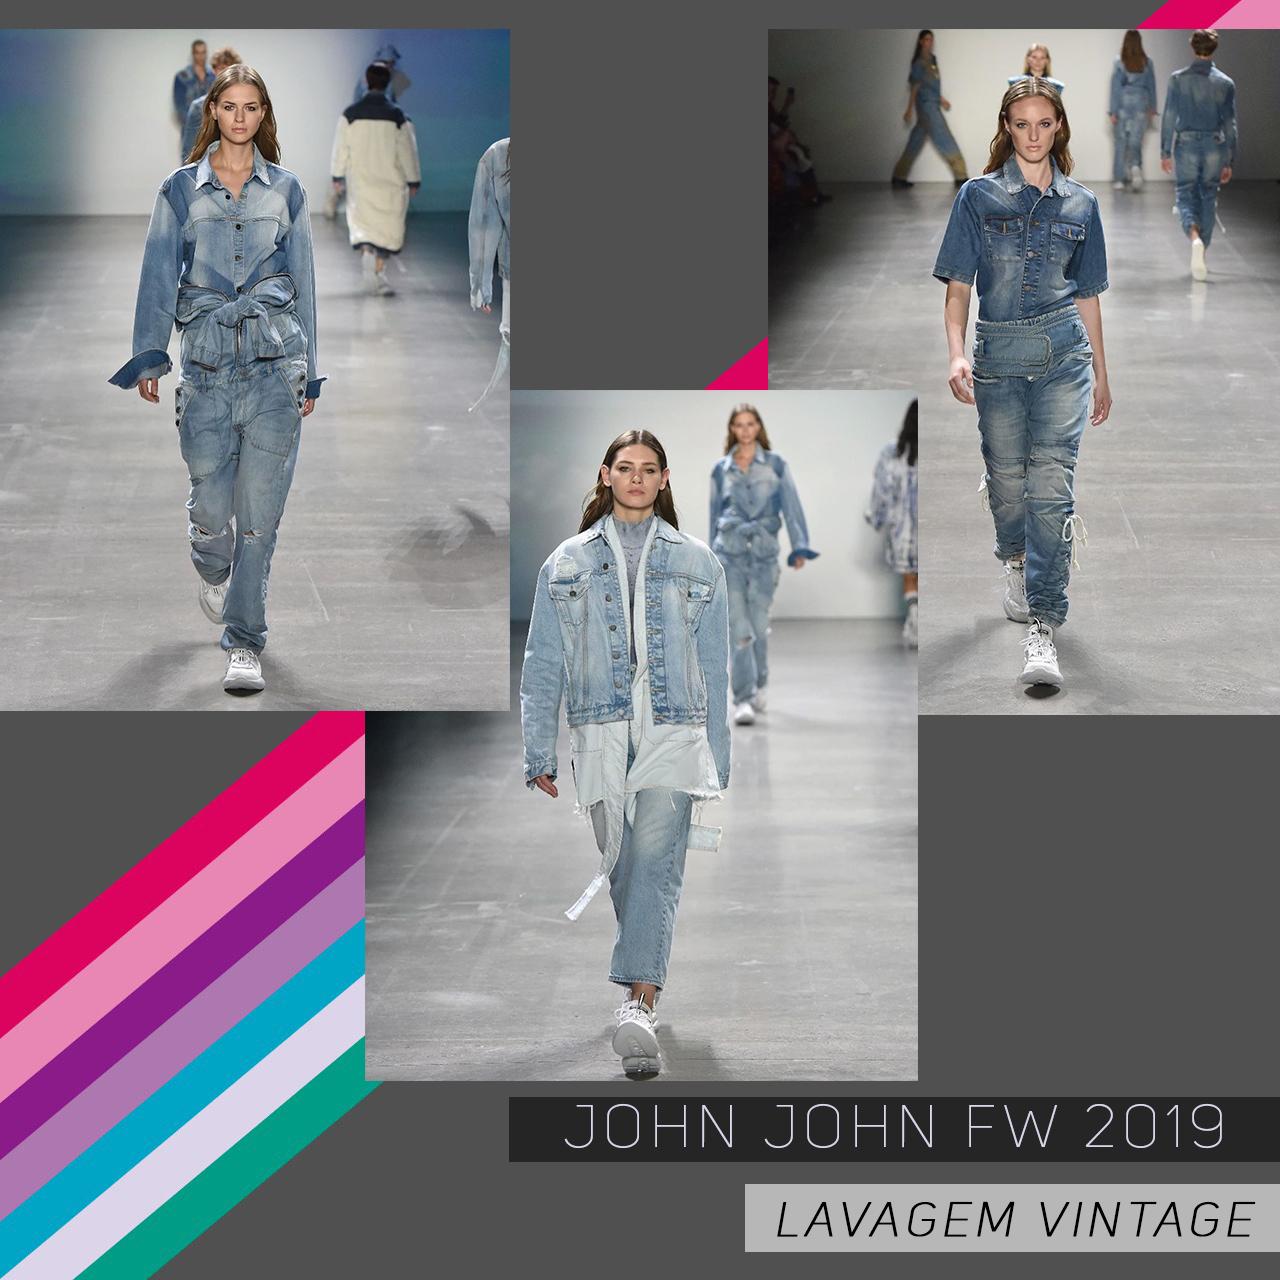 b41a1c794 JOHN JOHNF FW1 JOHN JOHNF FW2 vintage ...